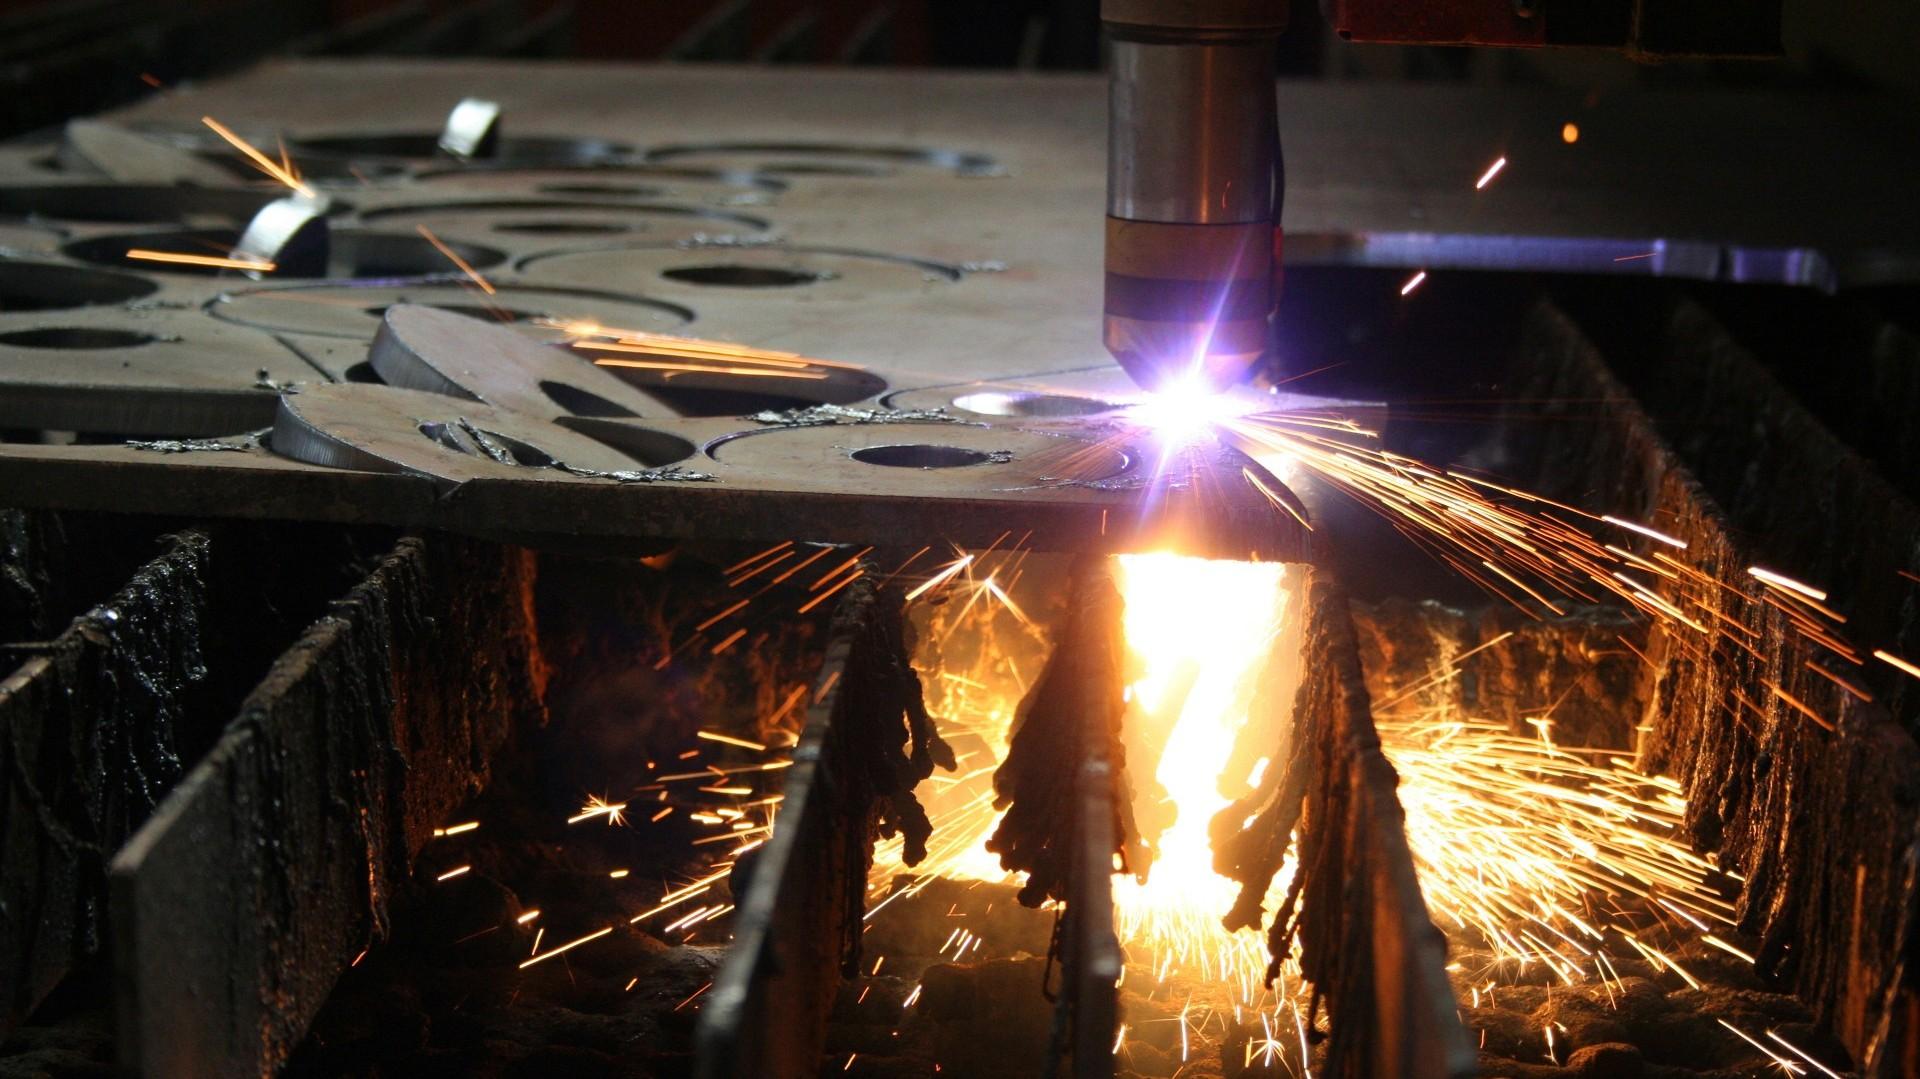 files/markham-flame-cutting.jpg